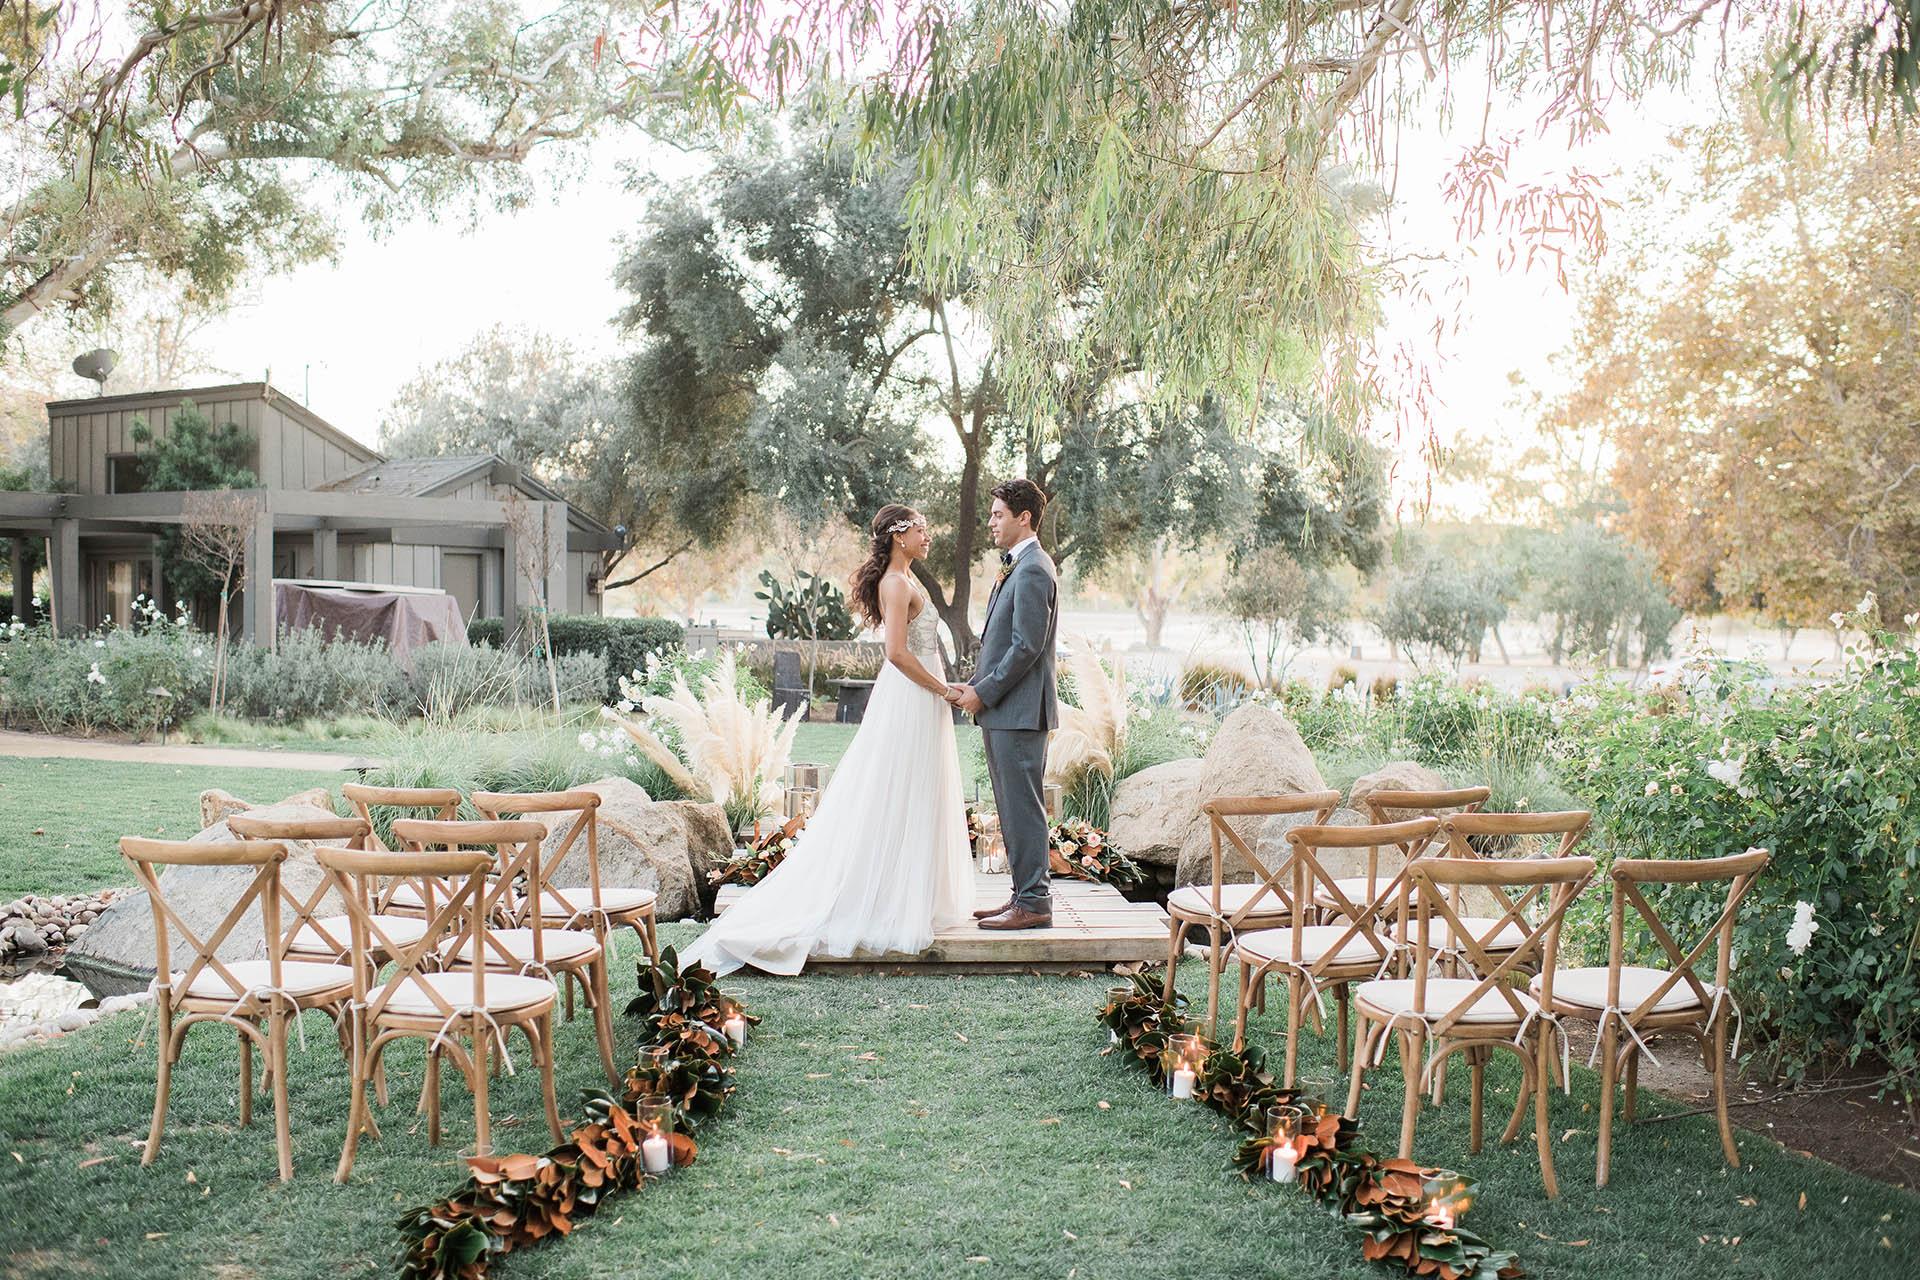 Rustic Outdoor Wedding Ceremony At Wedgewood Weddings Galway Downs Temecula California